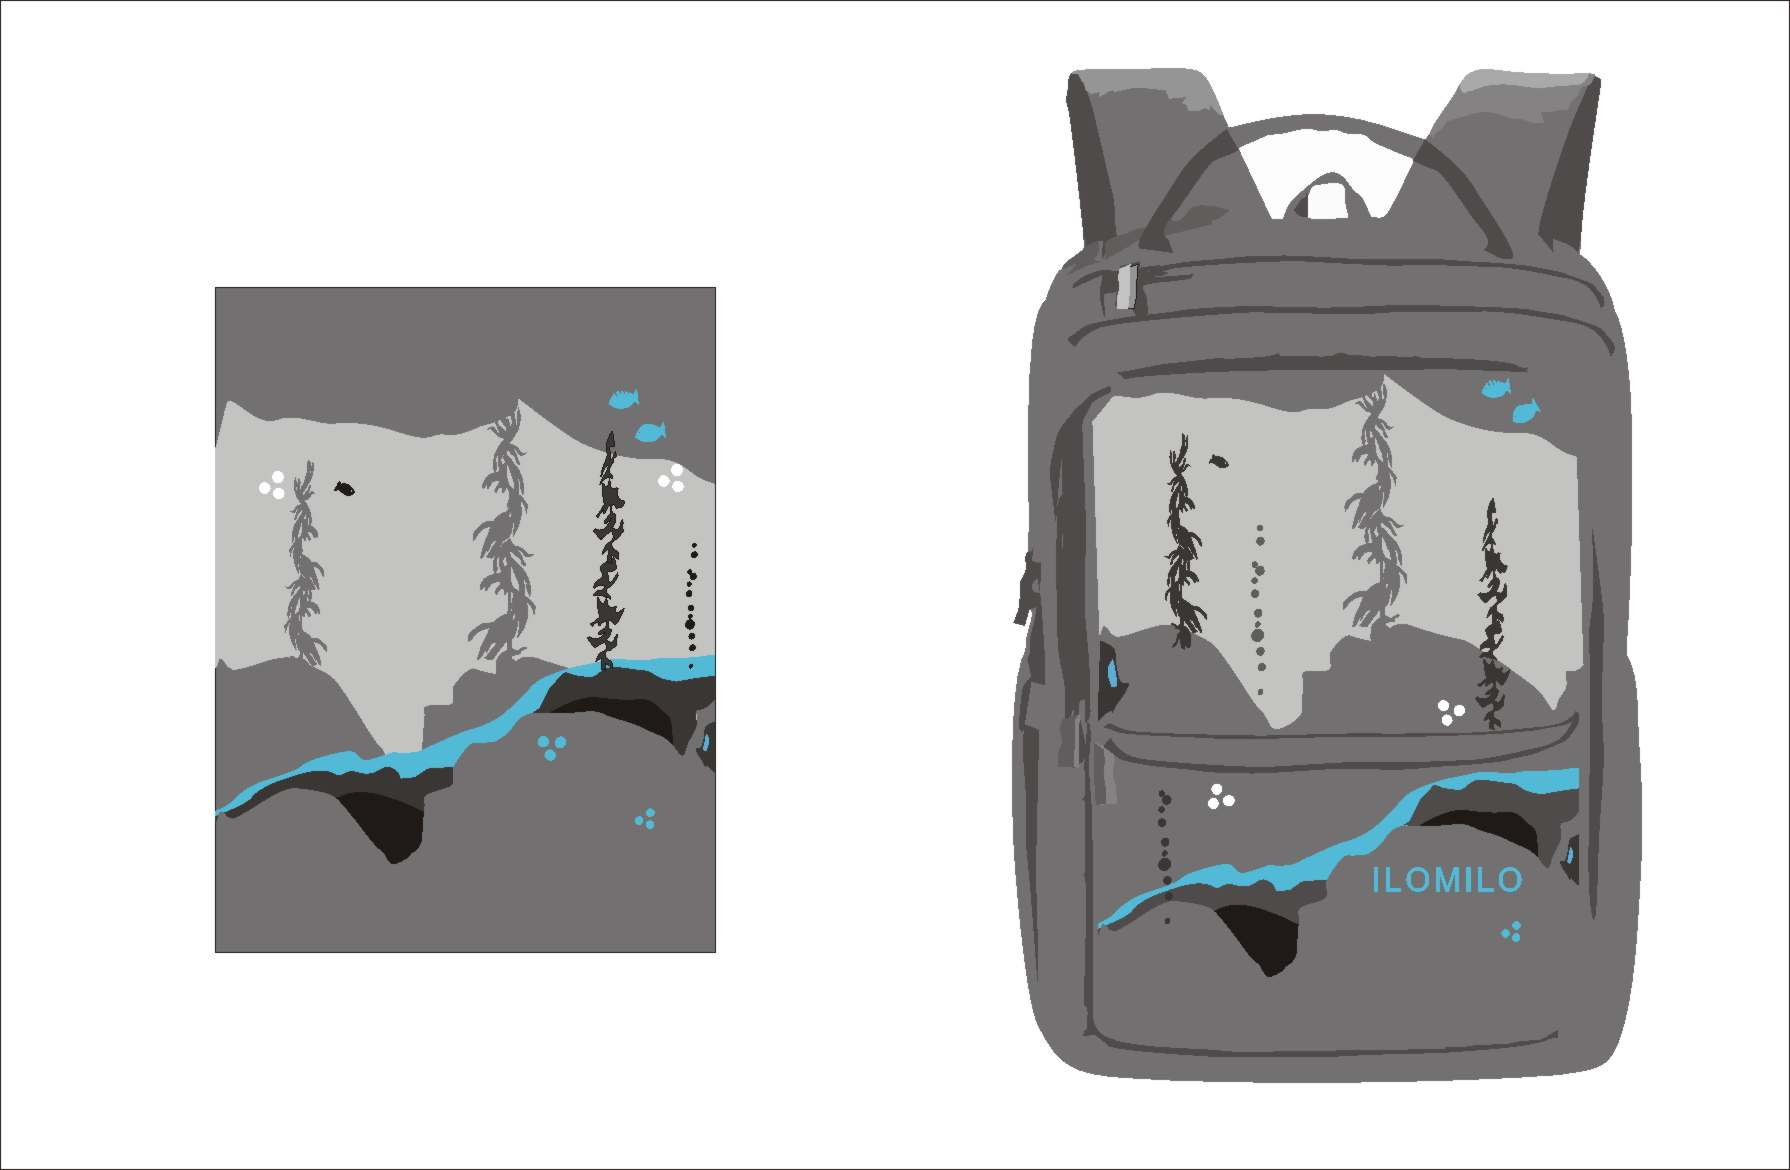 Конкурс на создание оригинального принта для рюкзаков фото f_8865f87196f15414.jpg